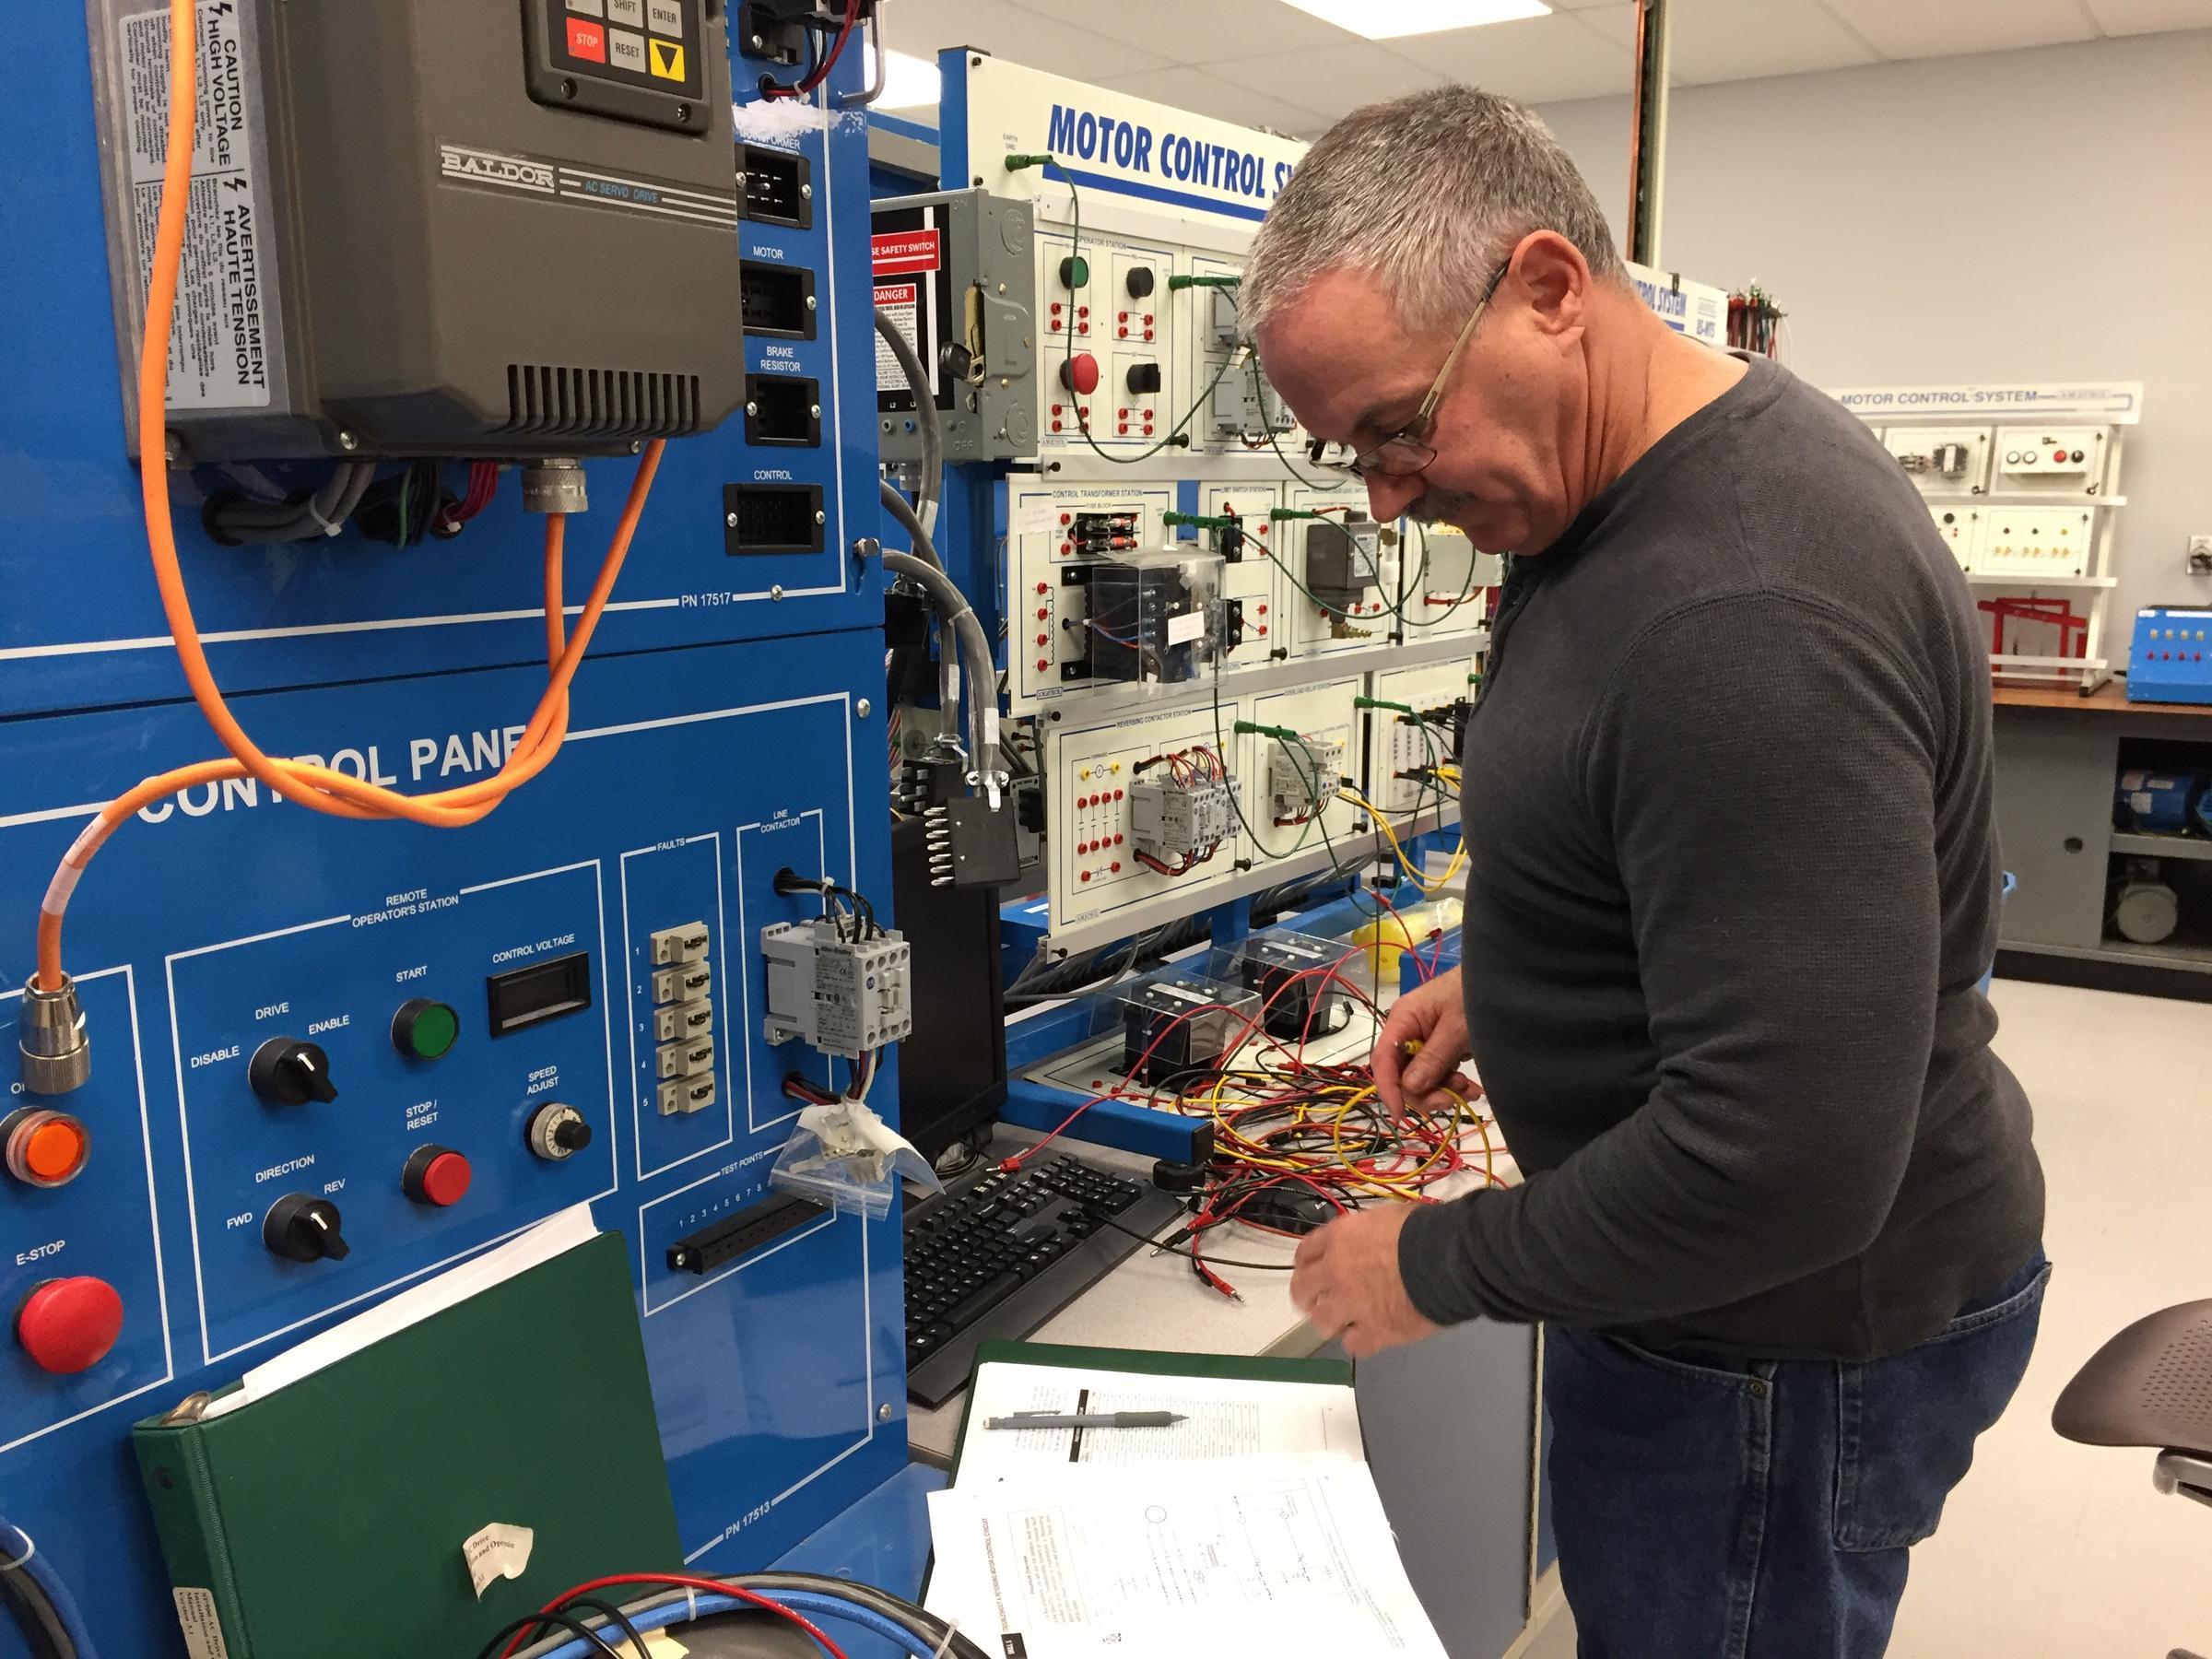 Battling The Skills Gap: Inside The Advanced Manufacturing